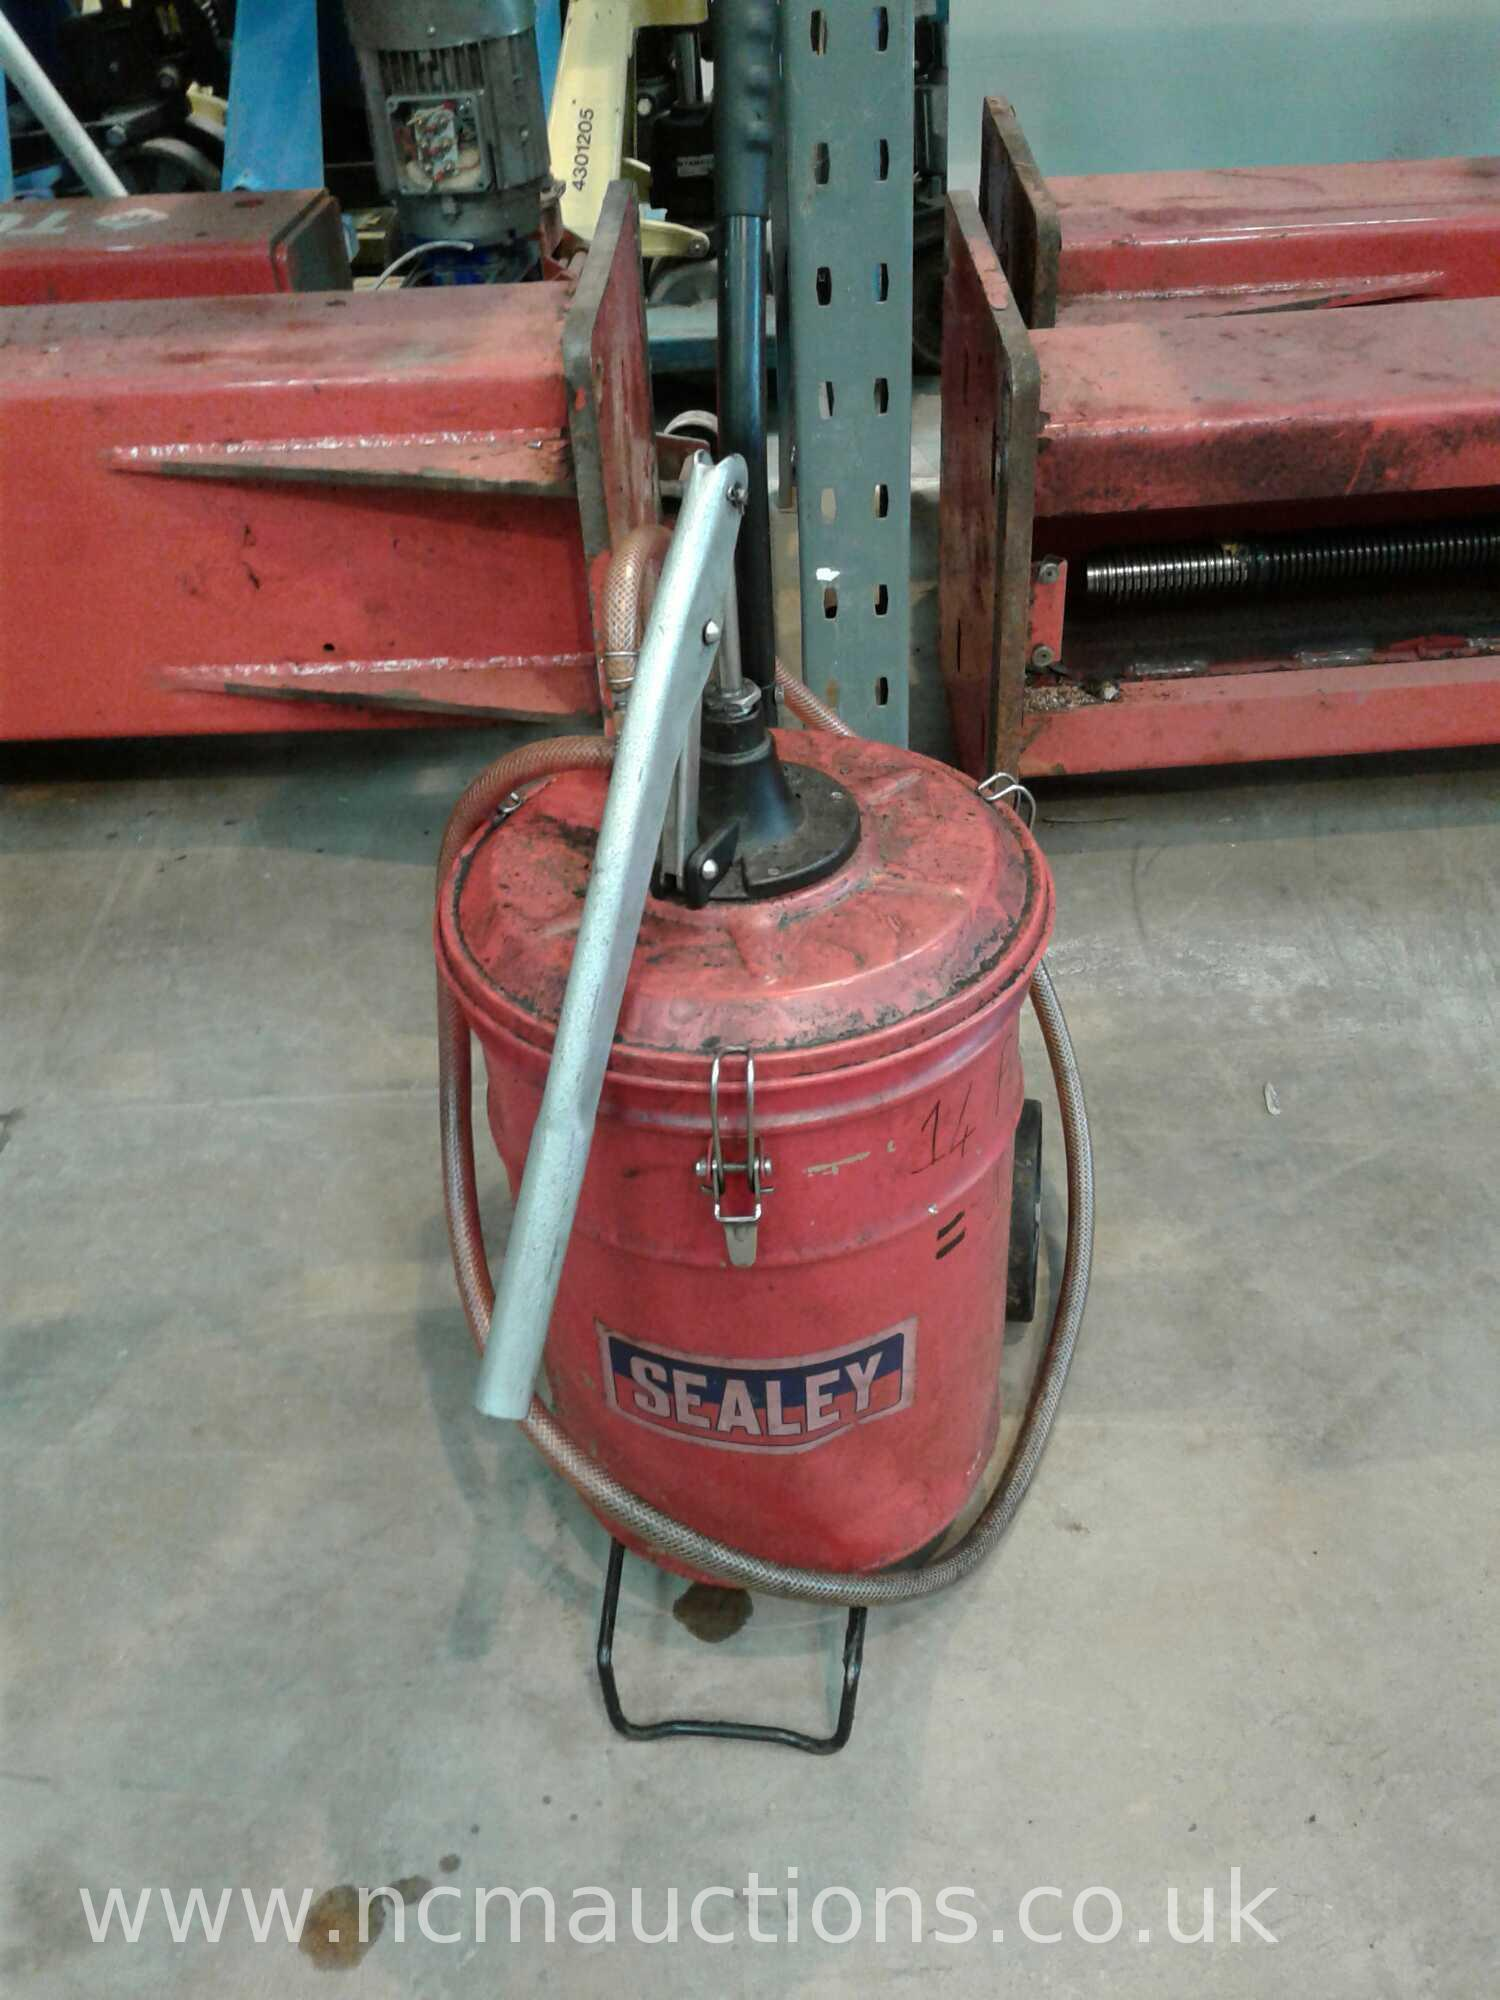 Lot 249 - Sealey fluid pump